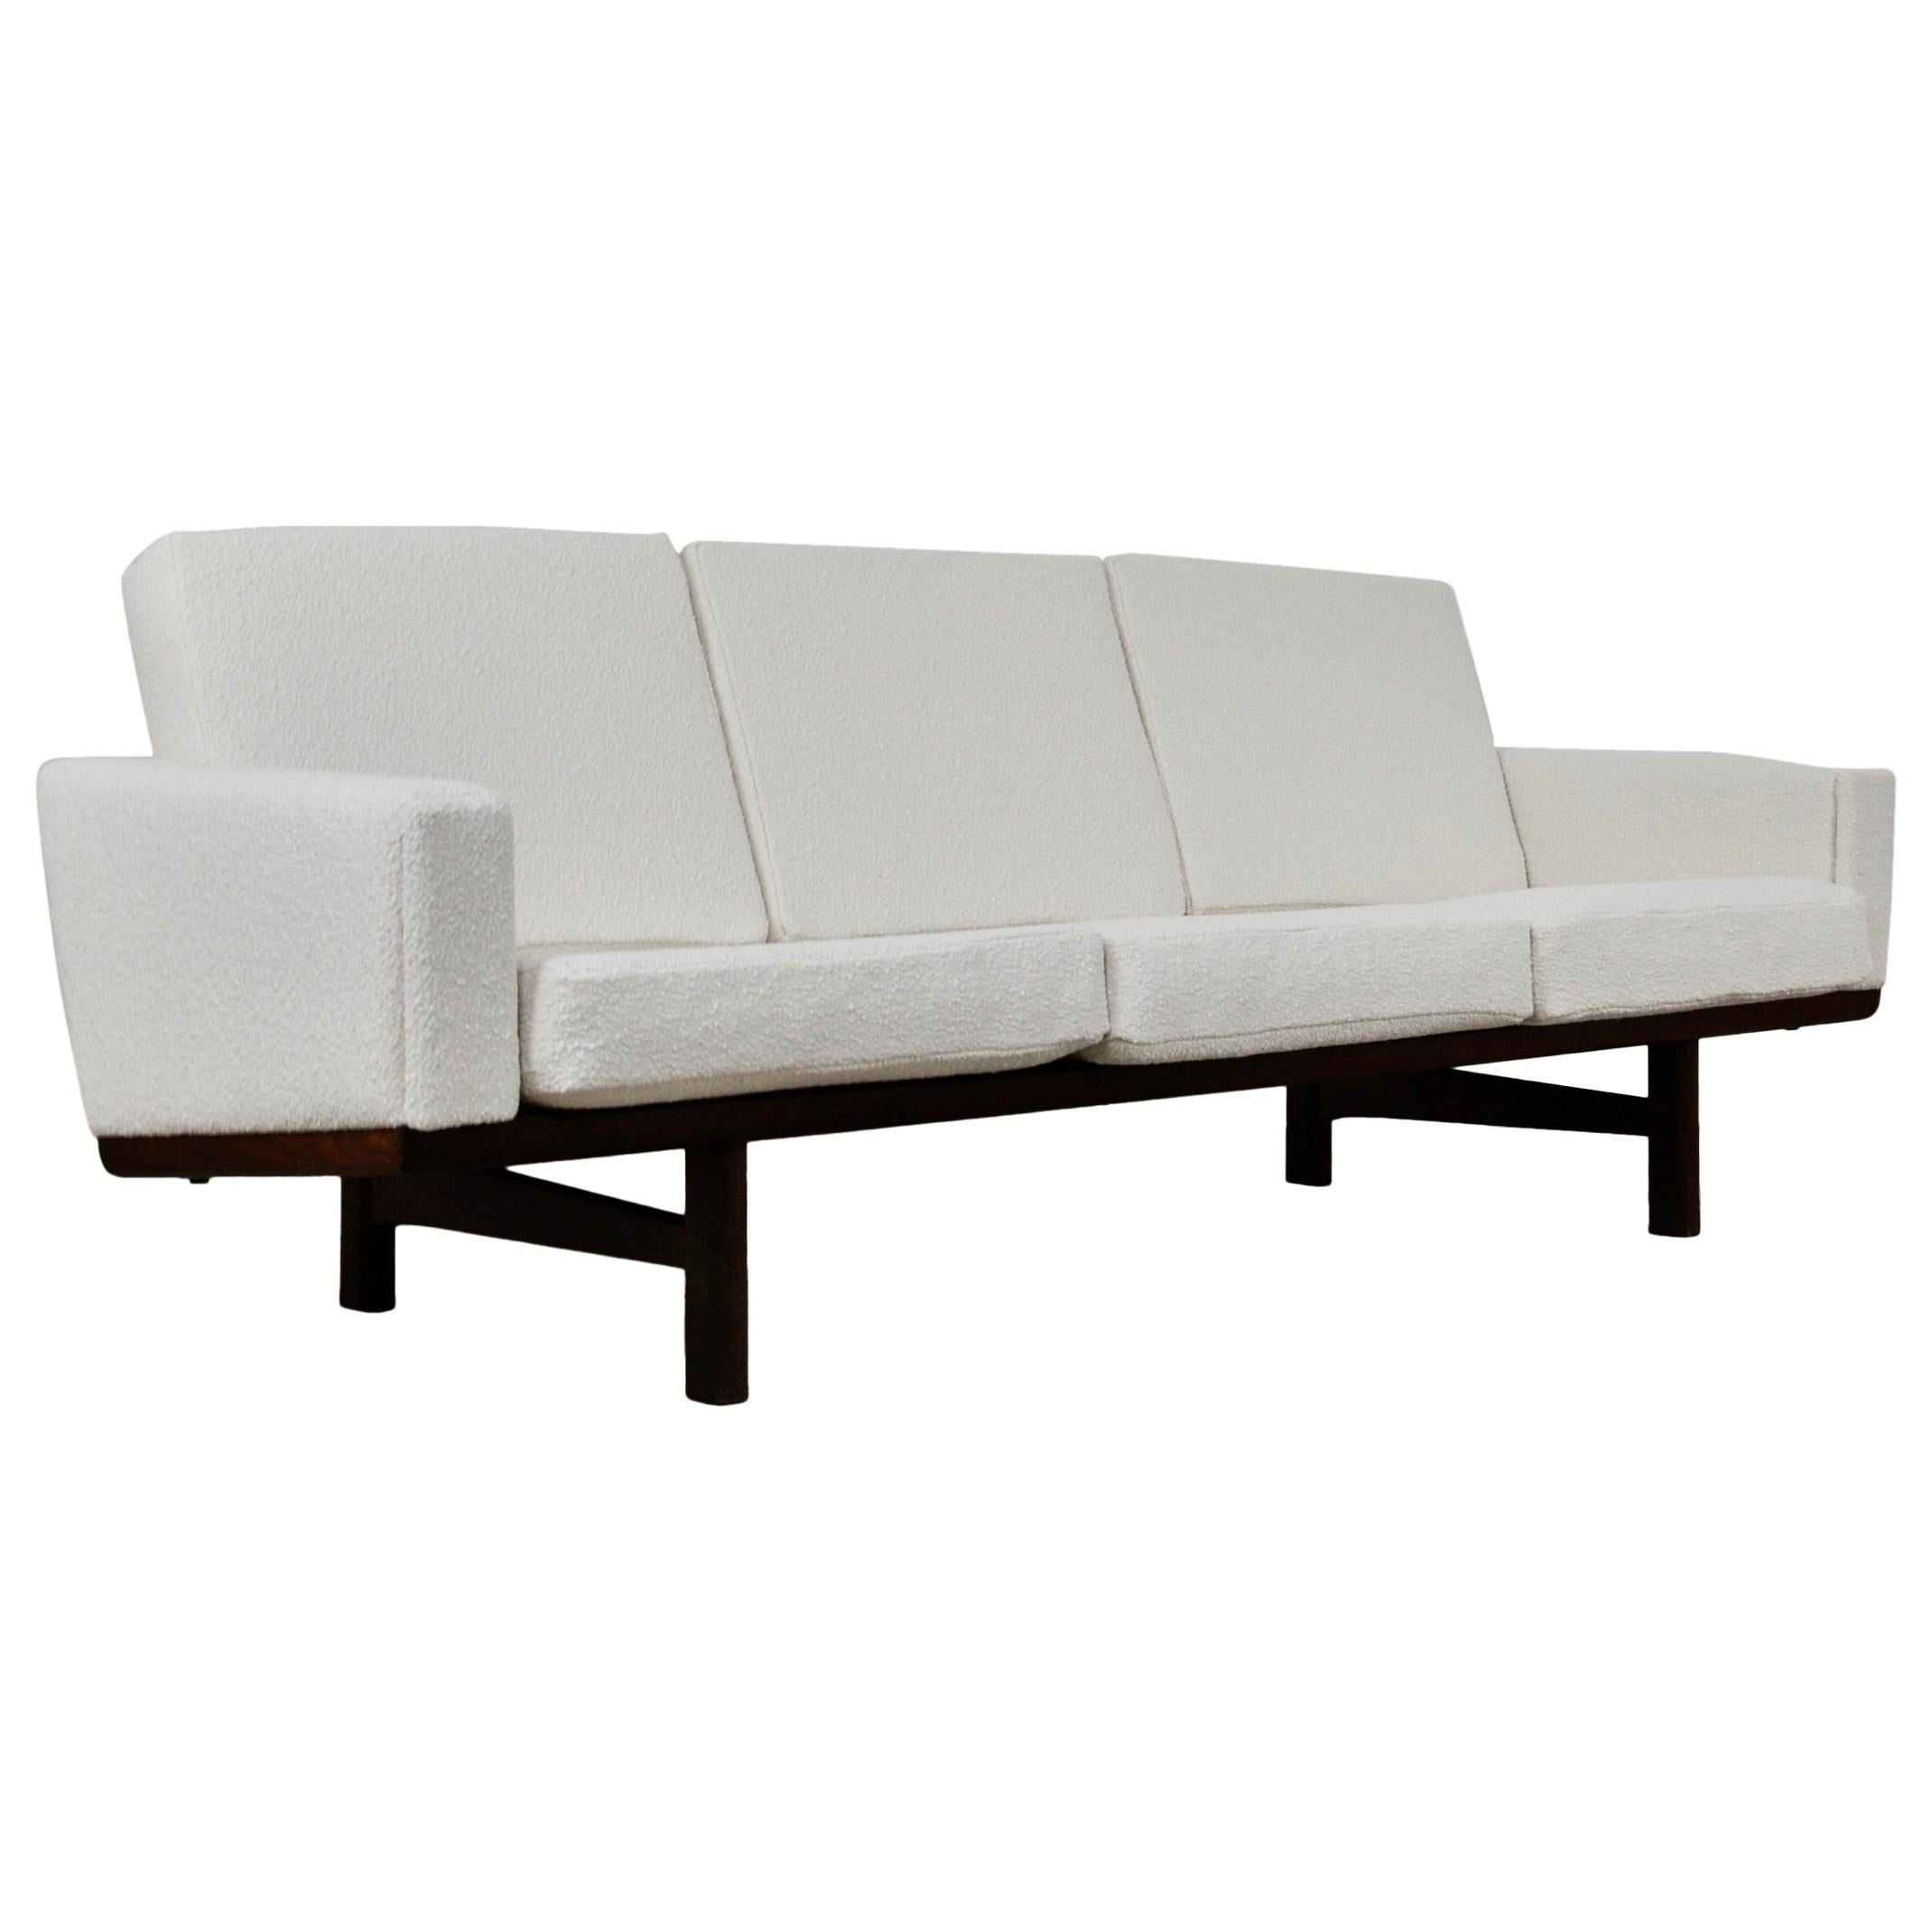 Sofa by Hans J. Wegner for GETAMA, 1960s